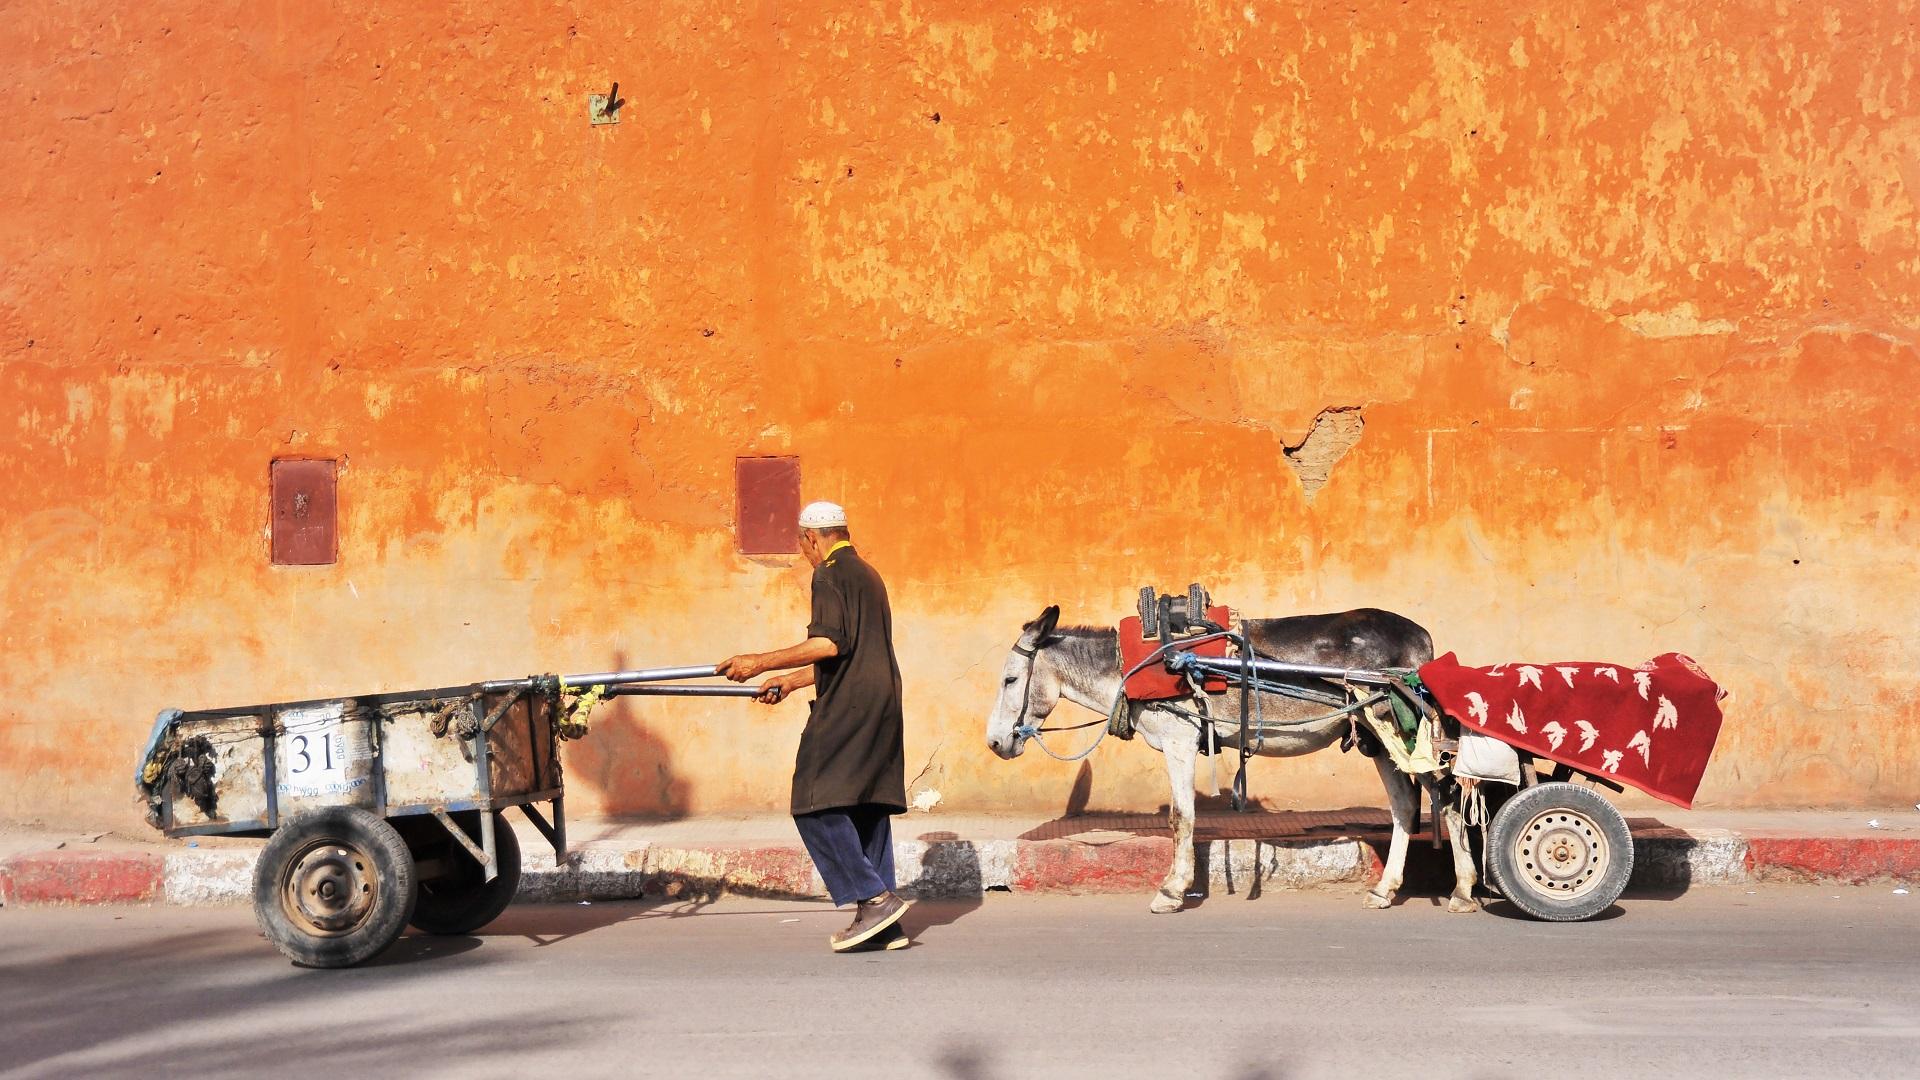 Man met ezel op straat in Marokko